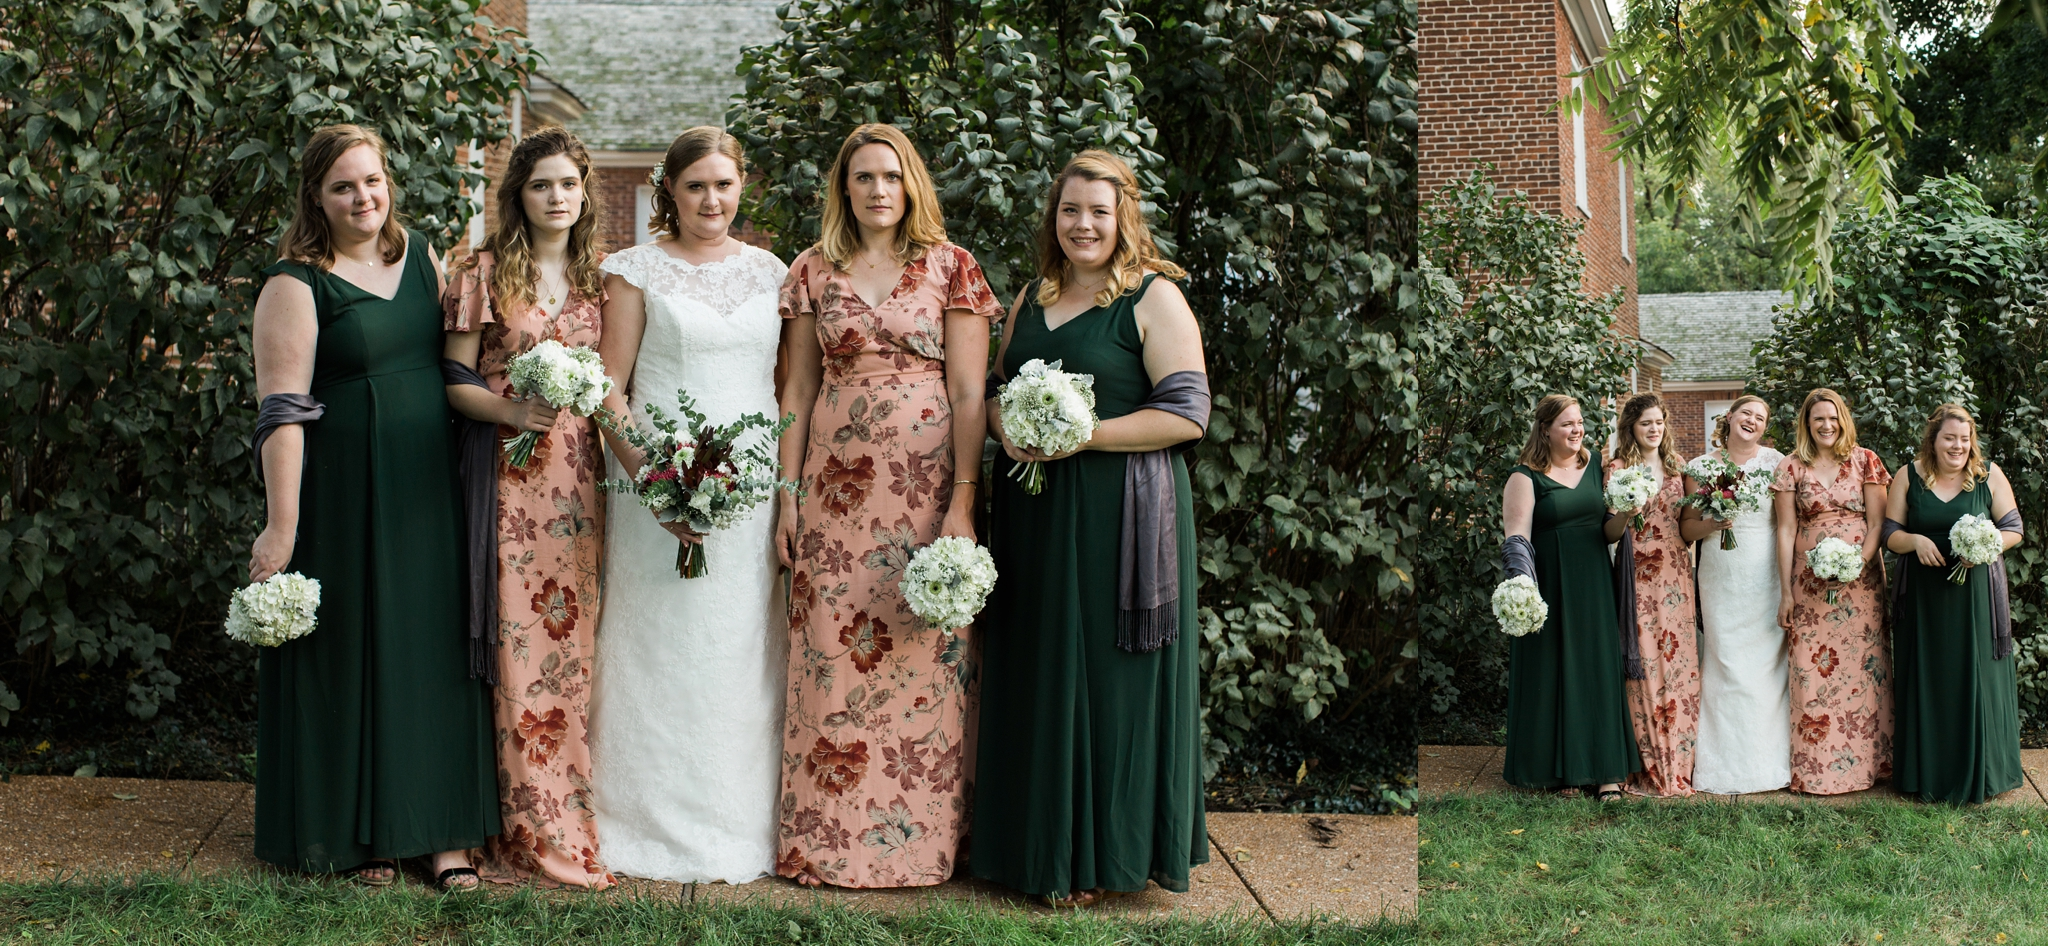 St Louis Wedding Photographer_0507.jpg